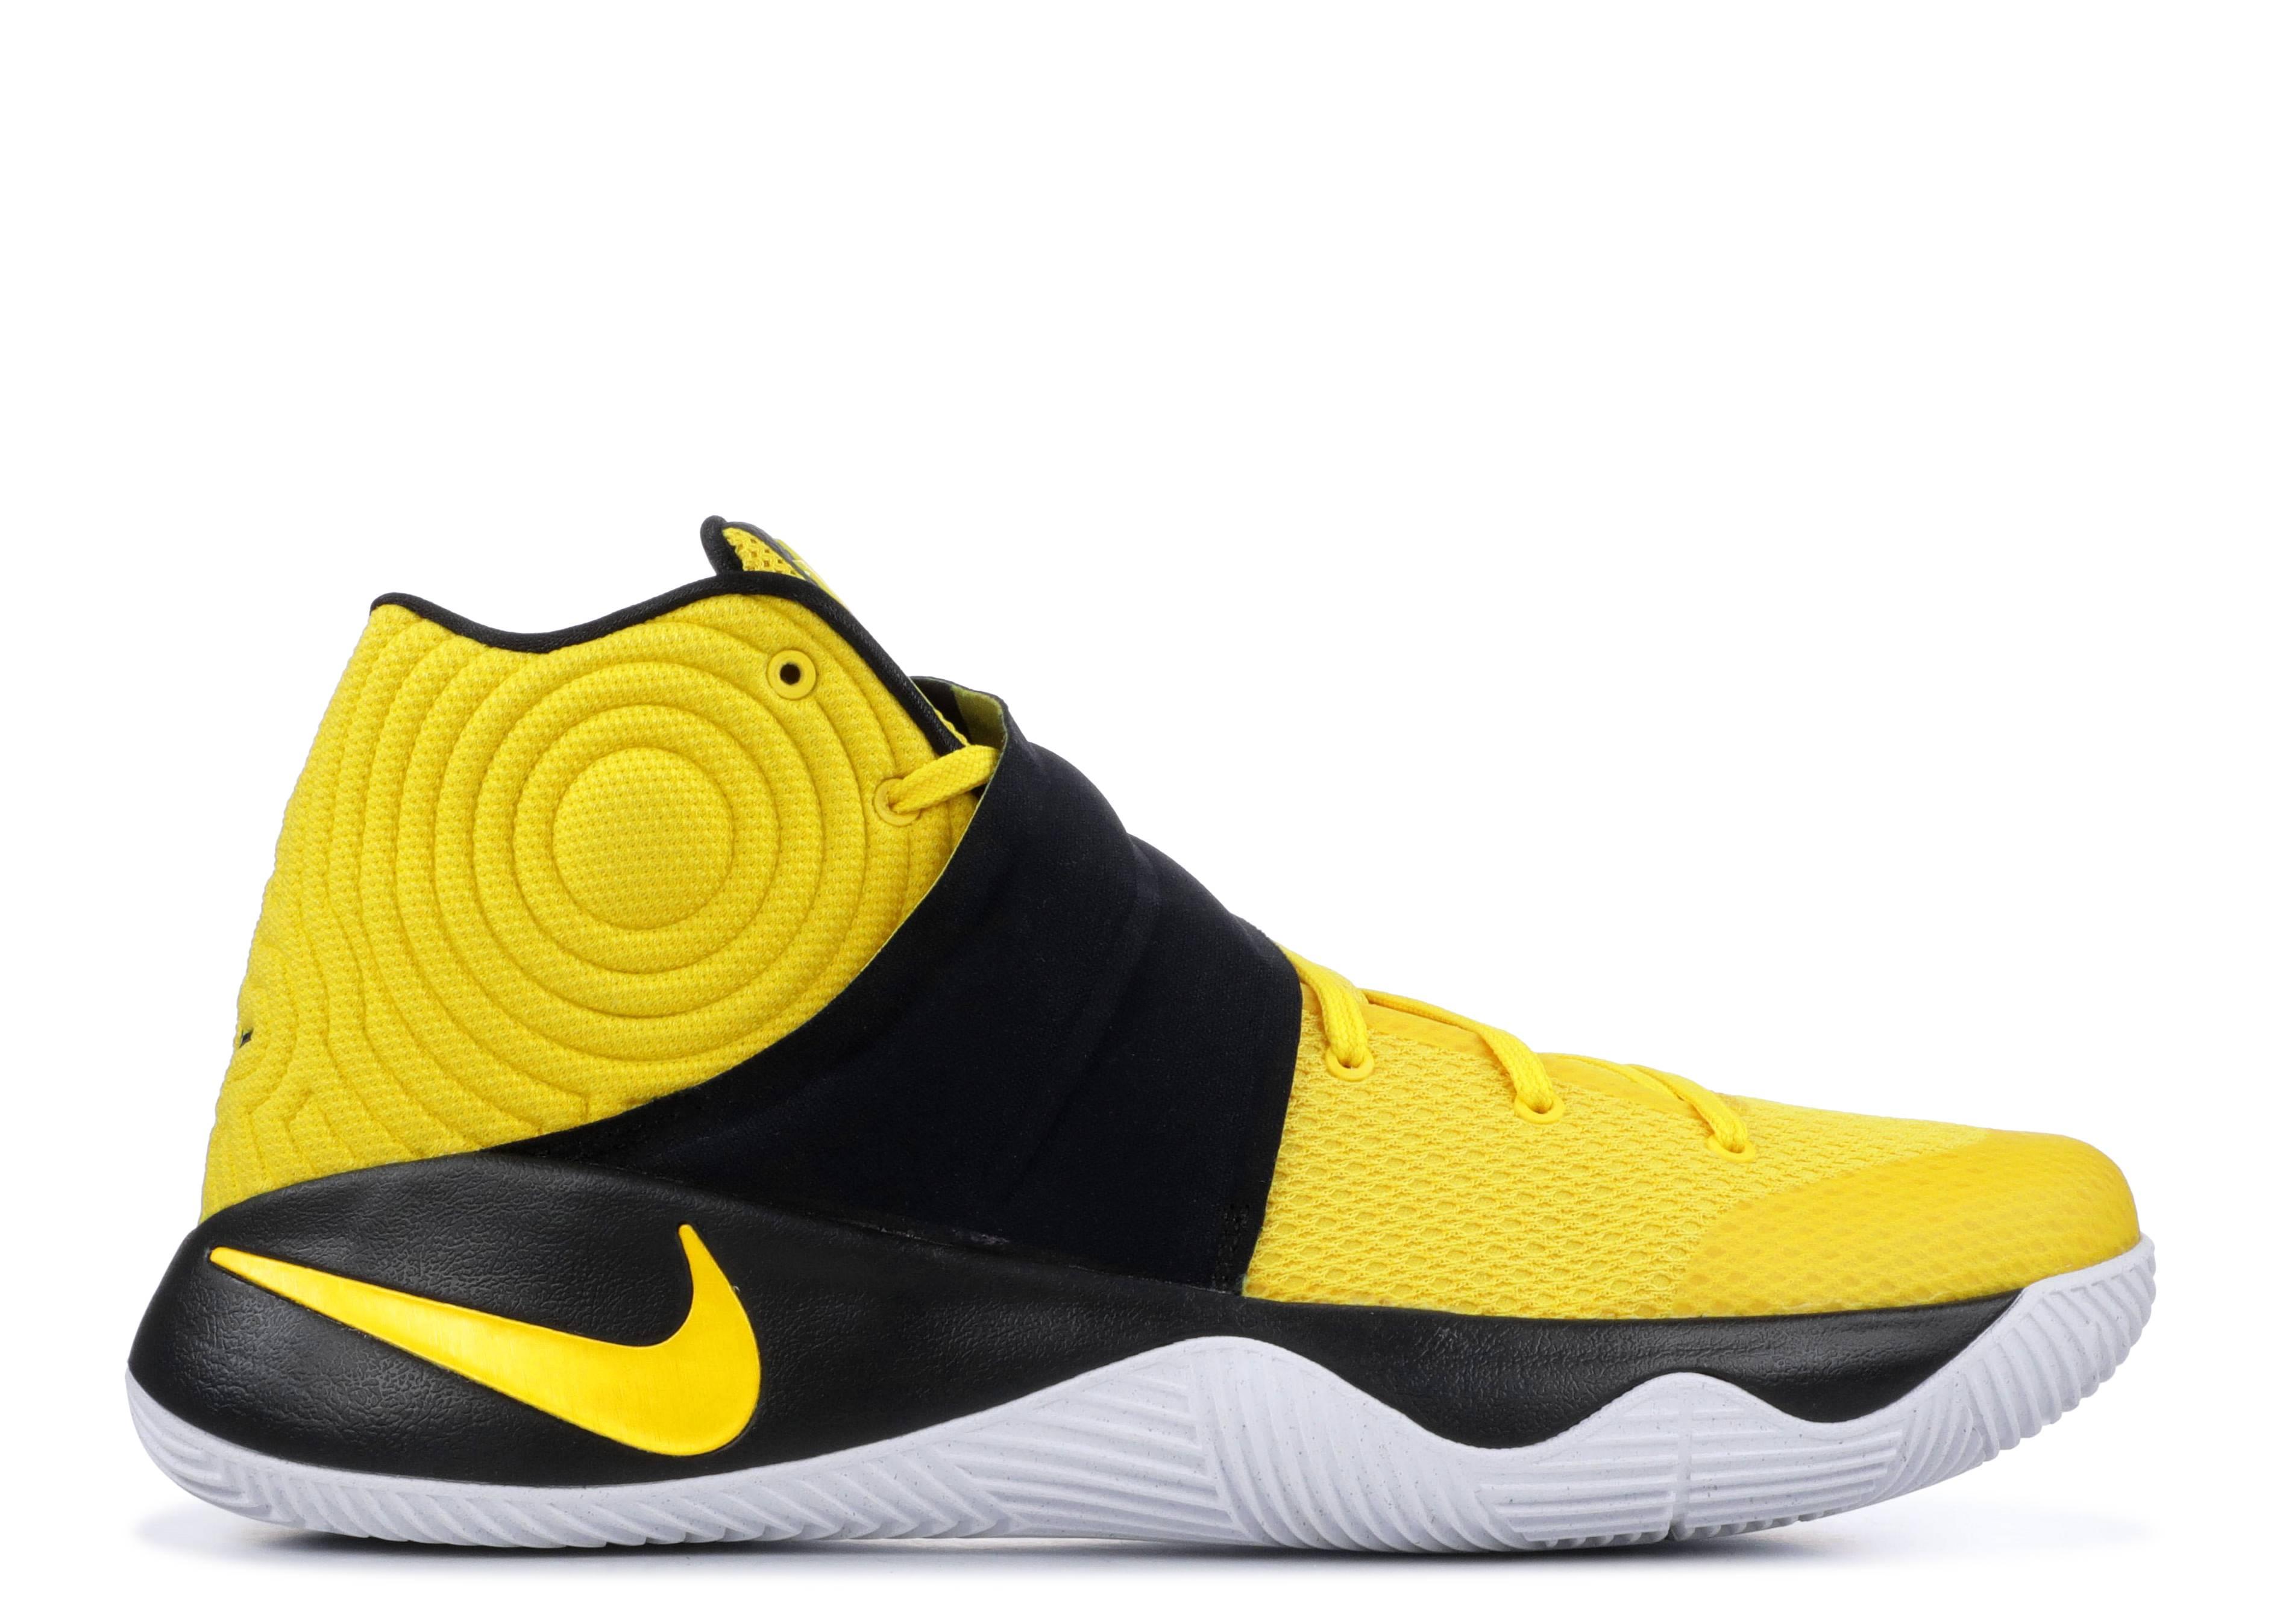 5d30085b8e7 Kyrie Irving - Nike Basketball - Nike